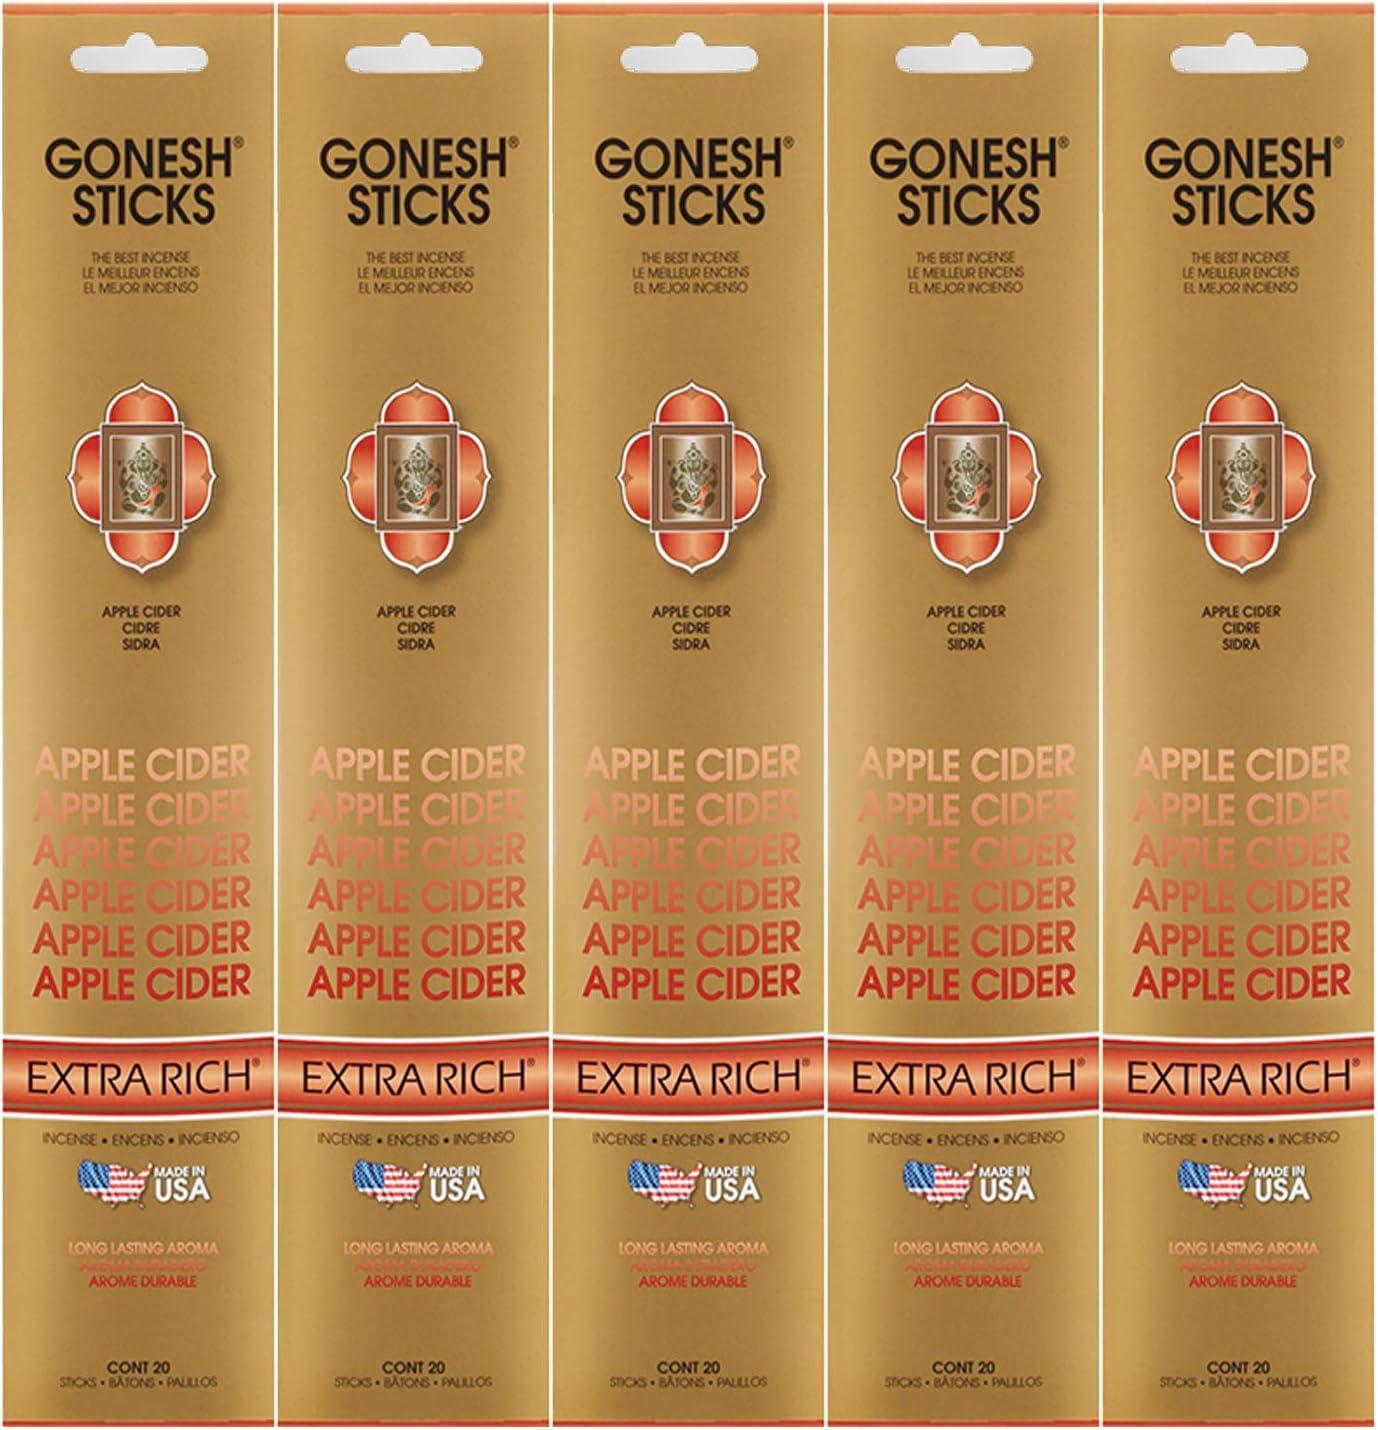 Gonesh Incense Sticks Extra Rich Collection - Apple Cider 5 Packs (100 Total)